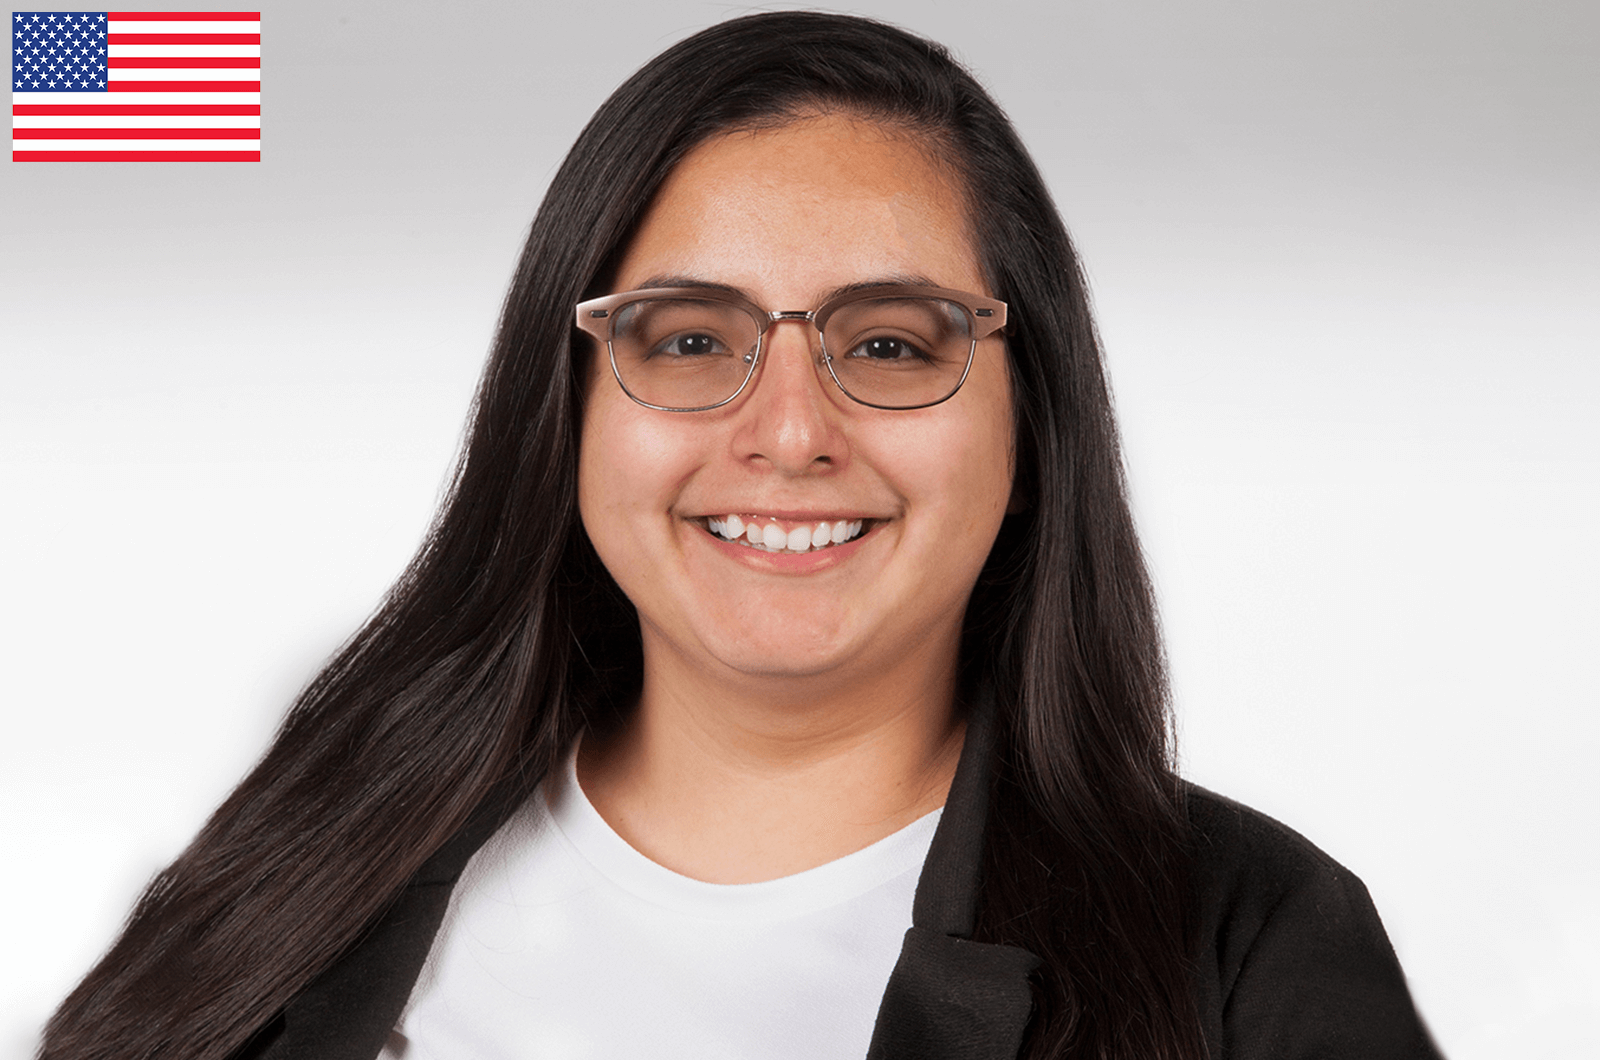 Beatriz Ibara in white shirt and black jacket smiling